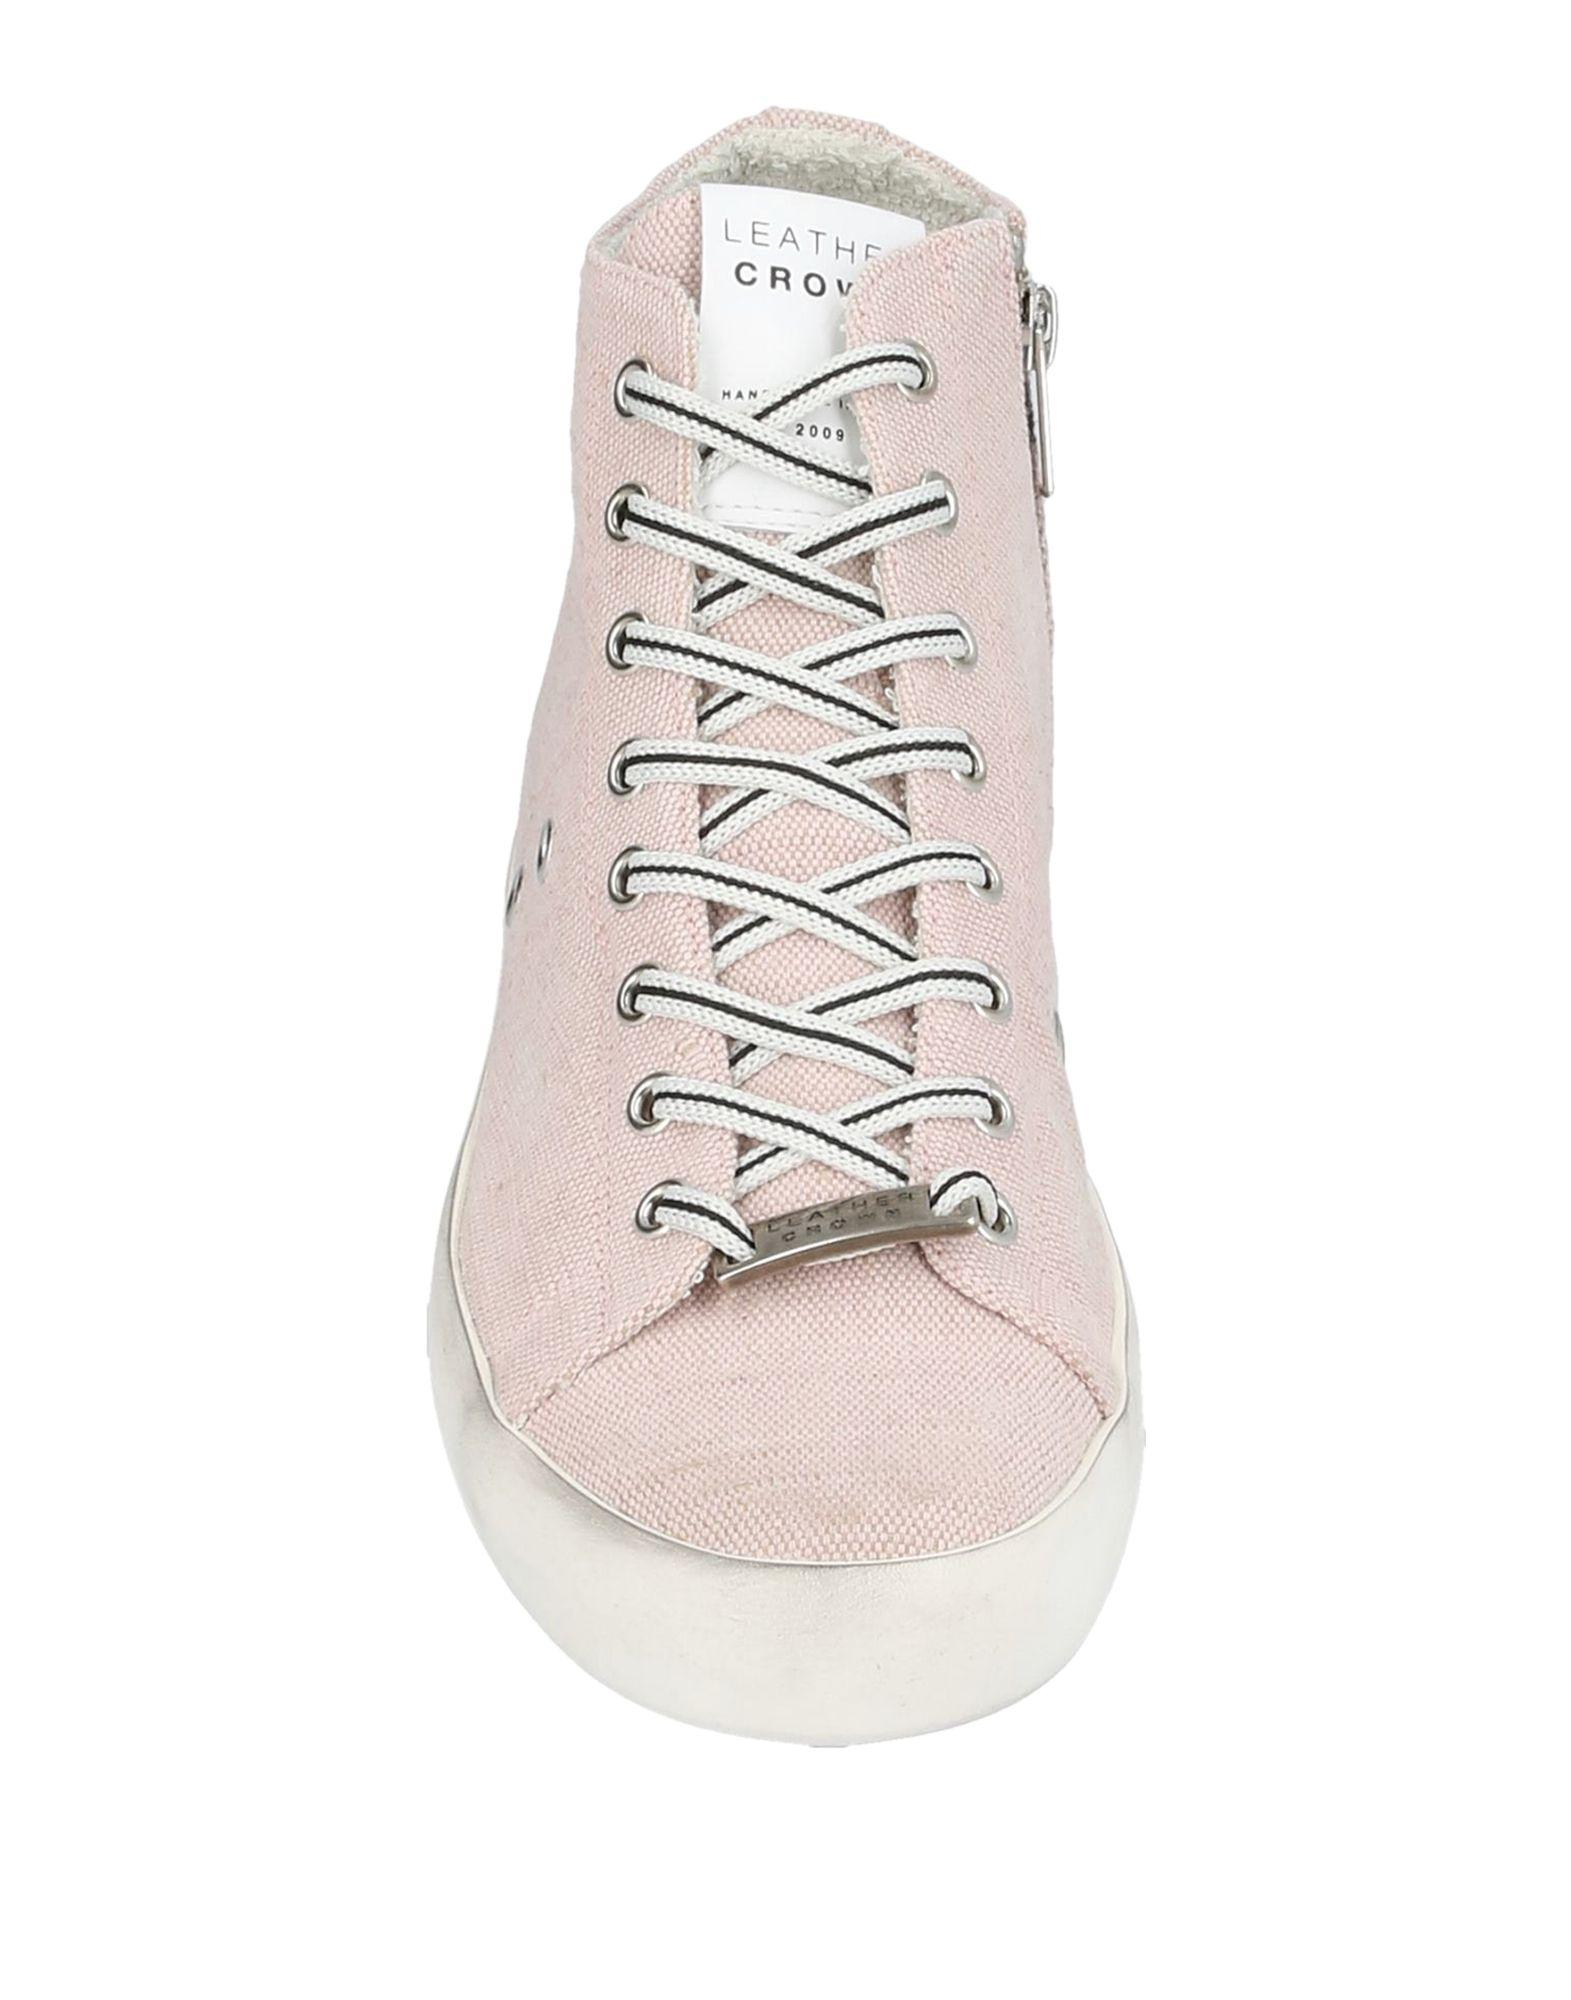 Sneakers & Tennis montantes Toile Leather Crown en coloris Rose iqqS